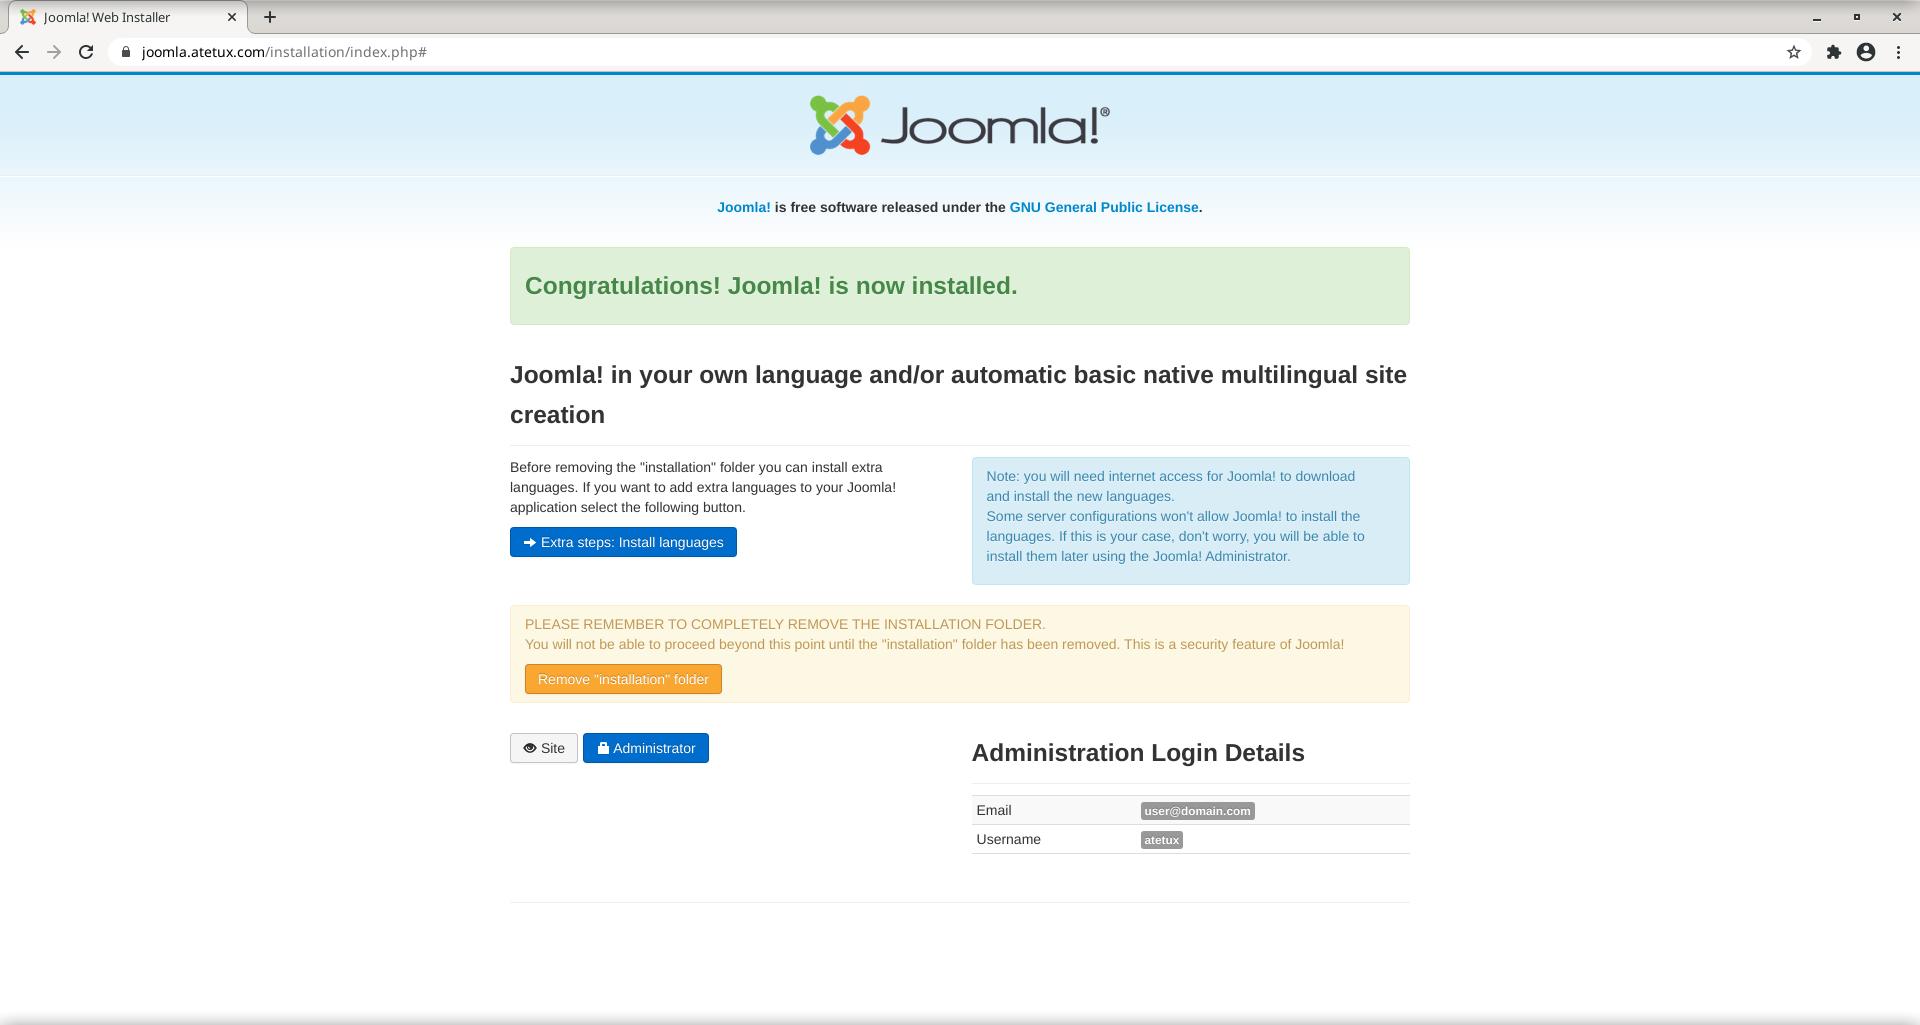 joomla instalation done